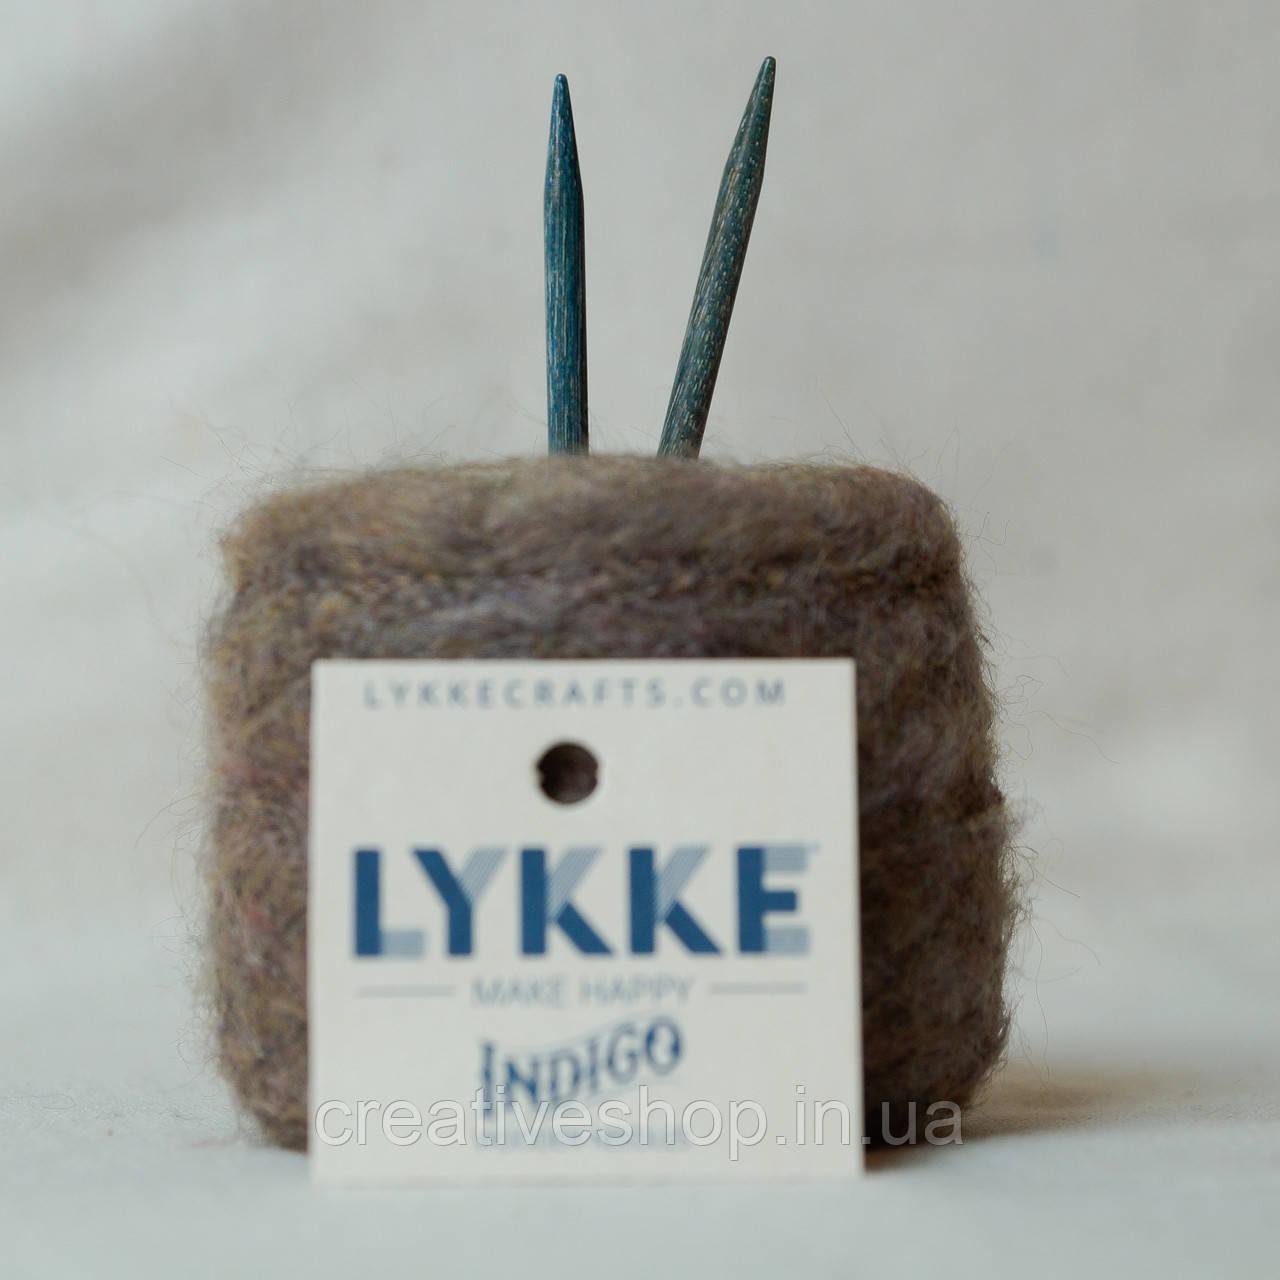 Съемные  стандартные спицы Lykke Indigo 4